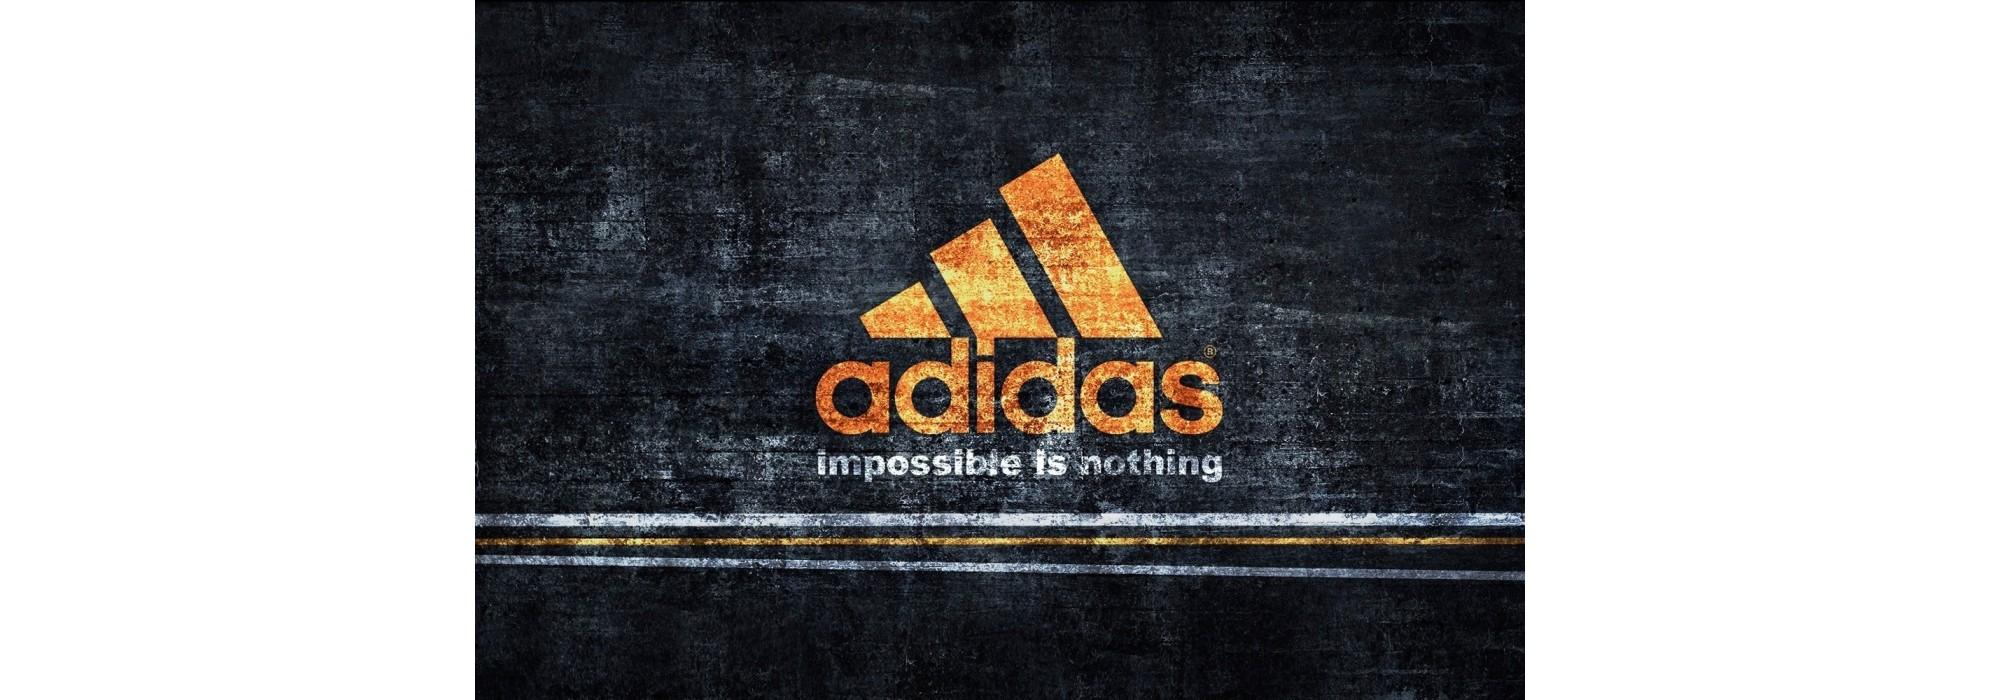 История создания бренда Adidas